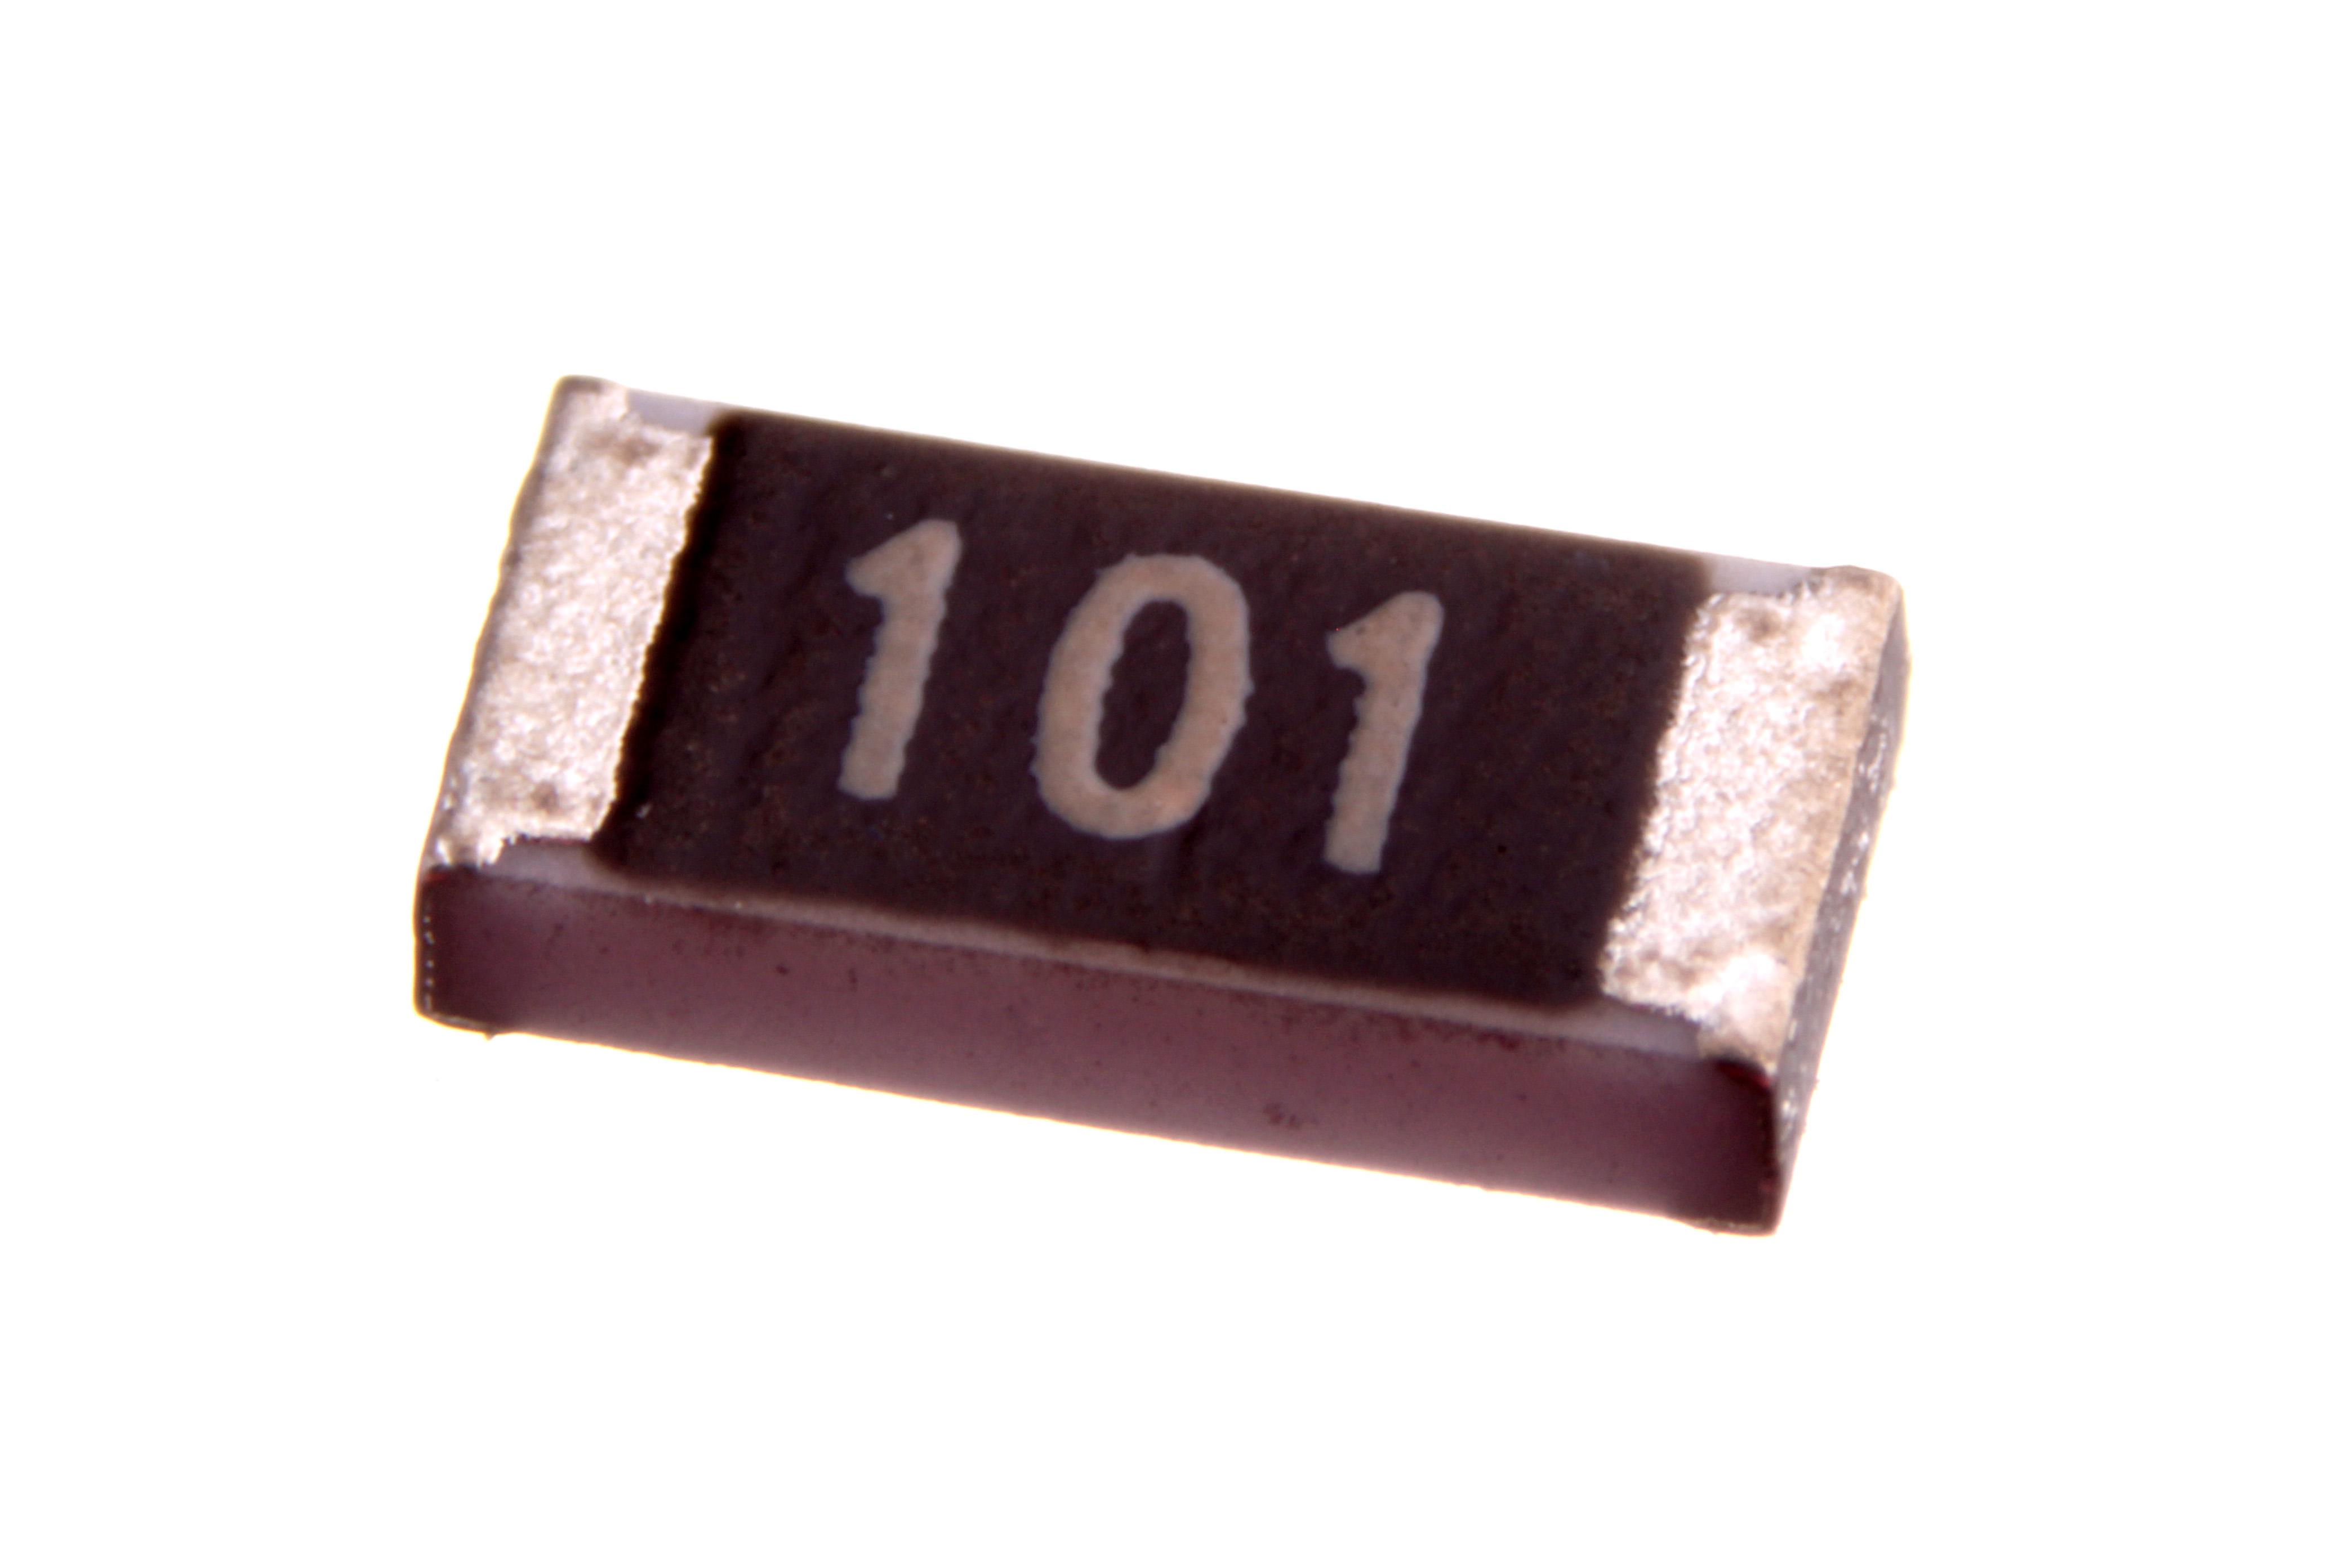 1206 resistor example